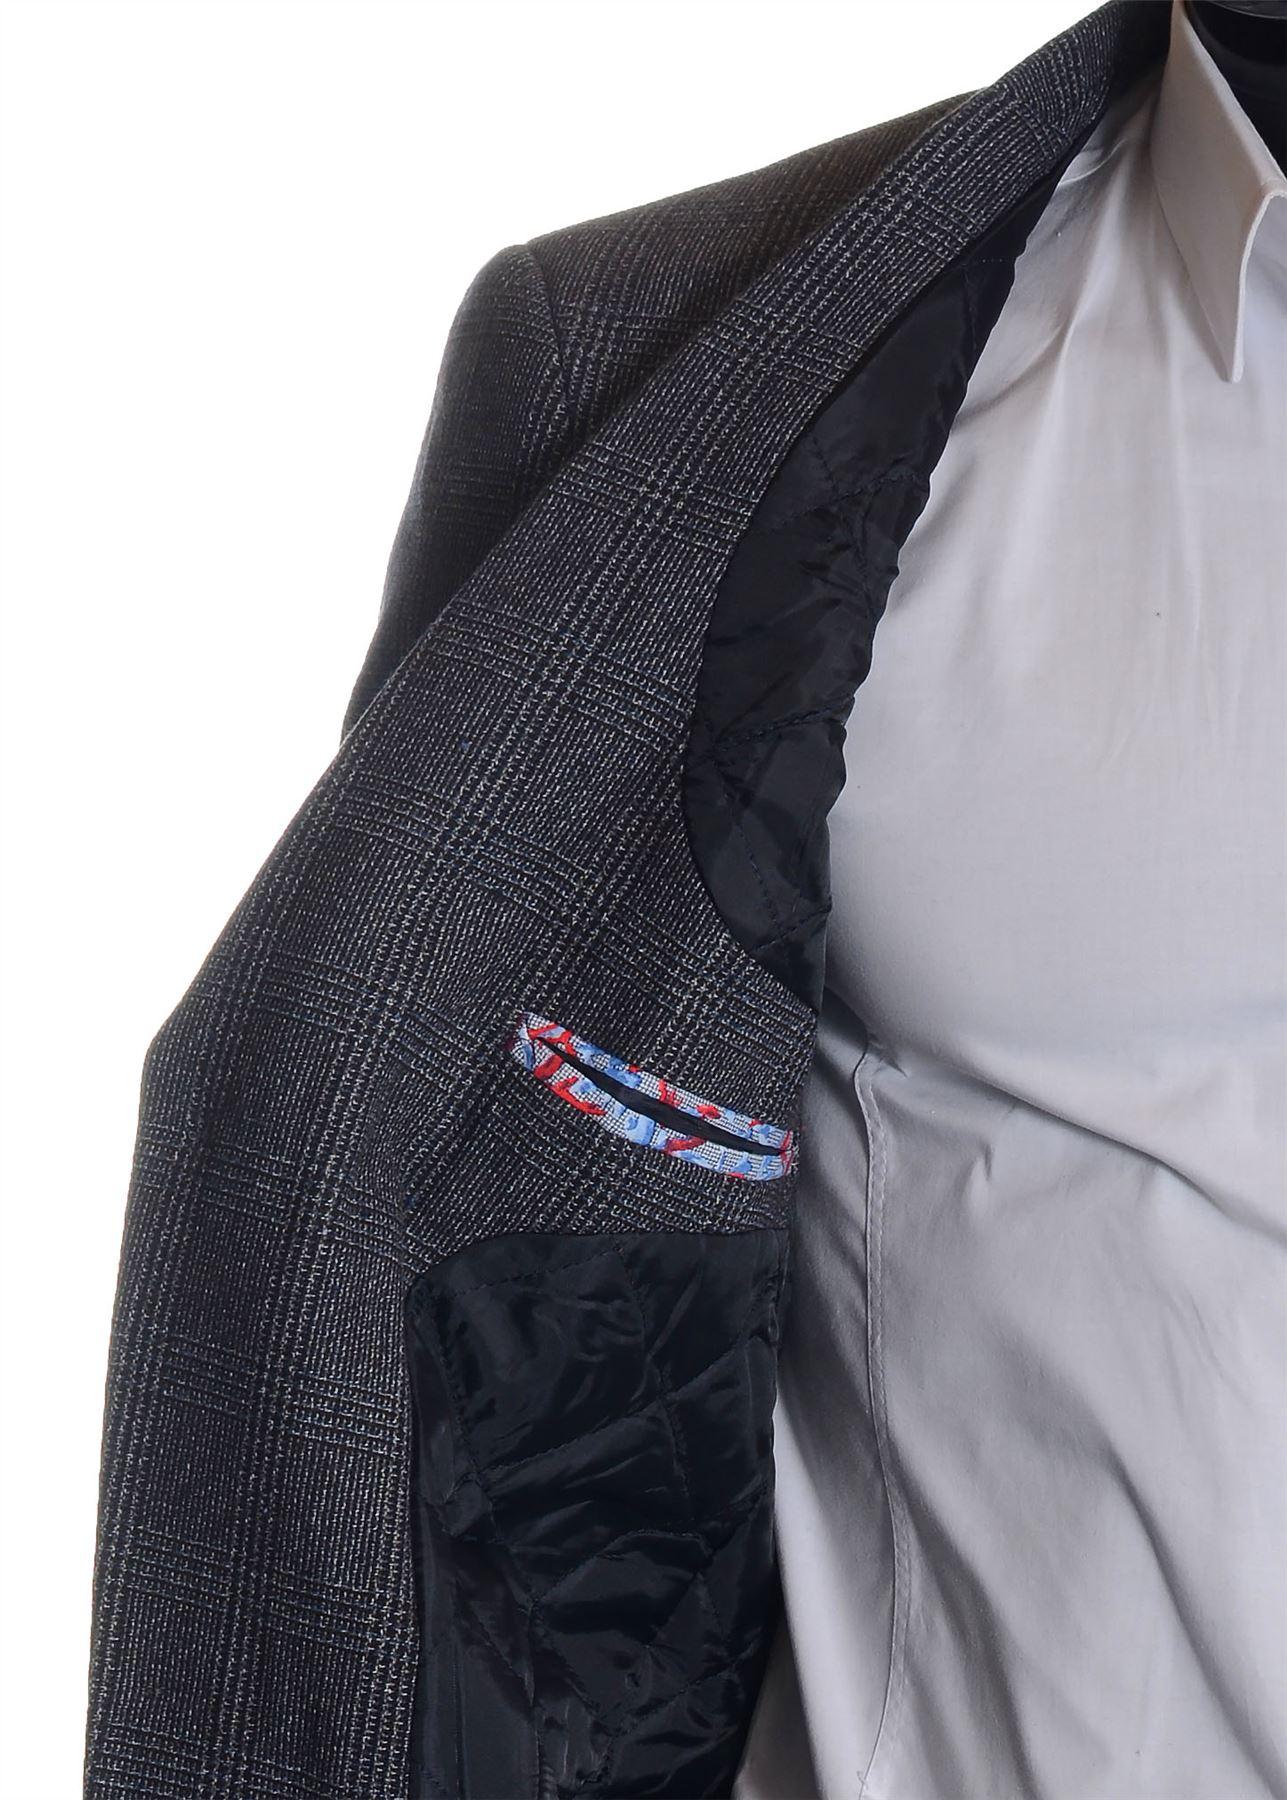 Men-039-s-Checkered-Coat-3-4-Long-Tweed-Cashmere-Wool-Trendy-Formal-Winter-Overcoat thumbnail 28